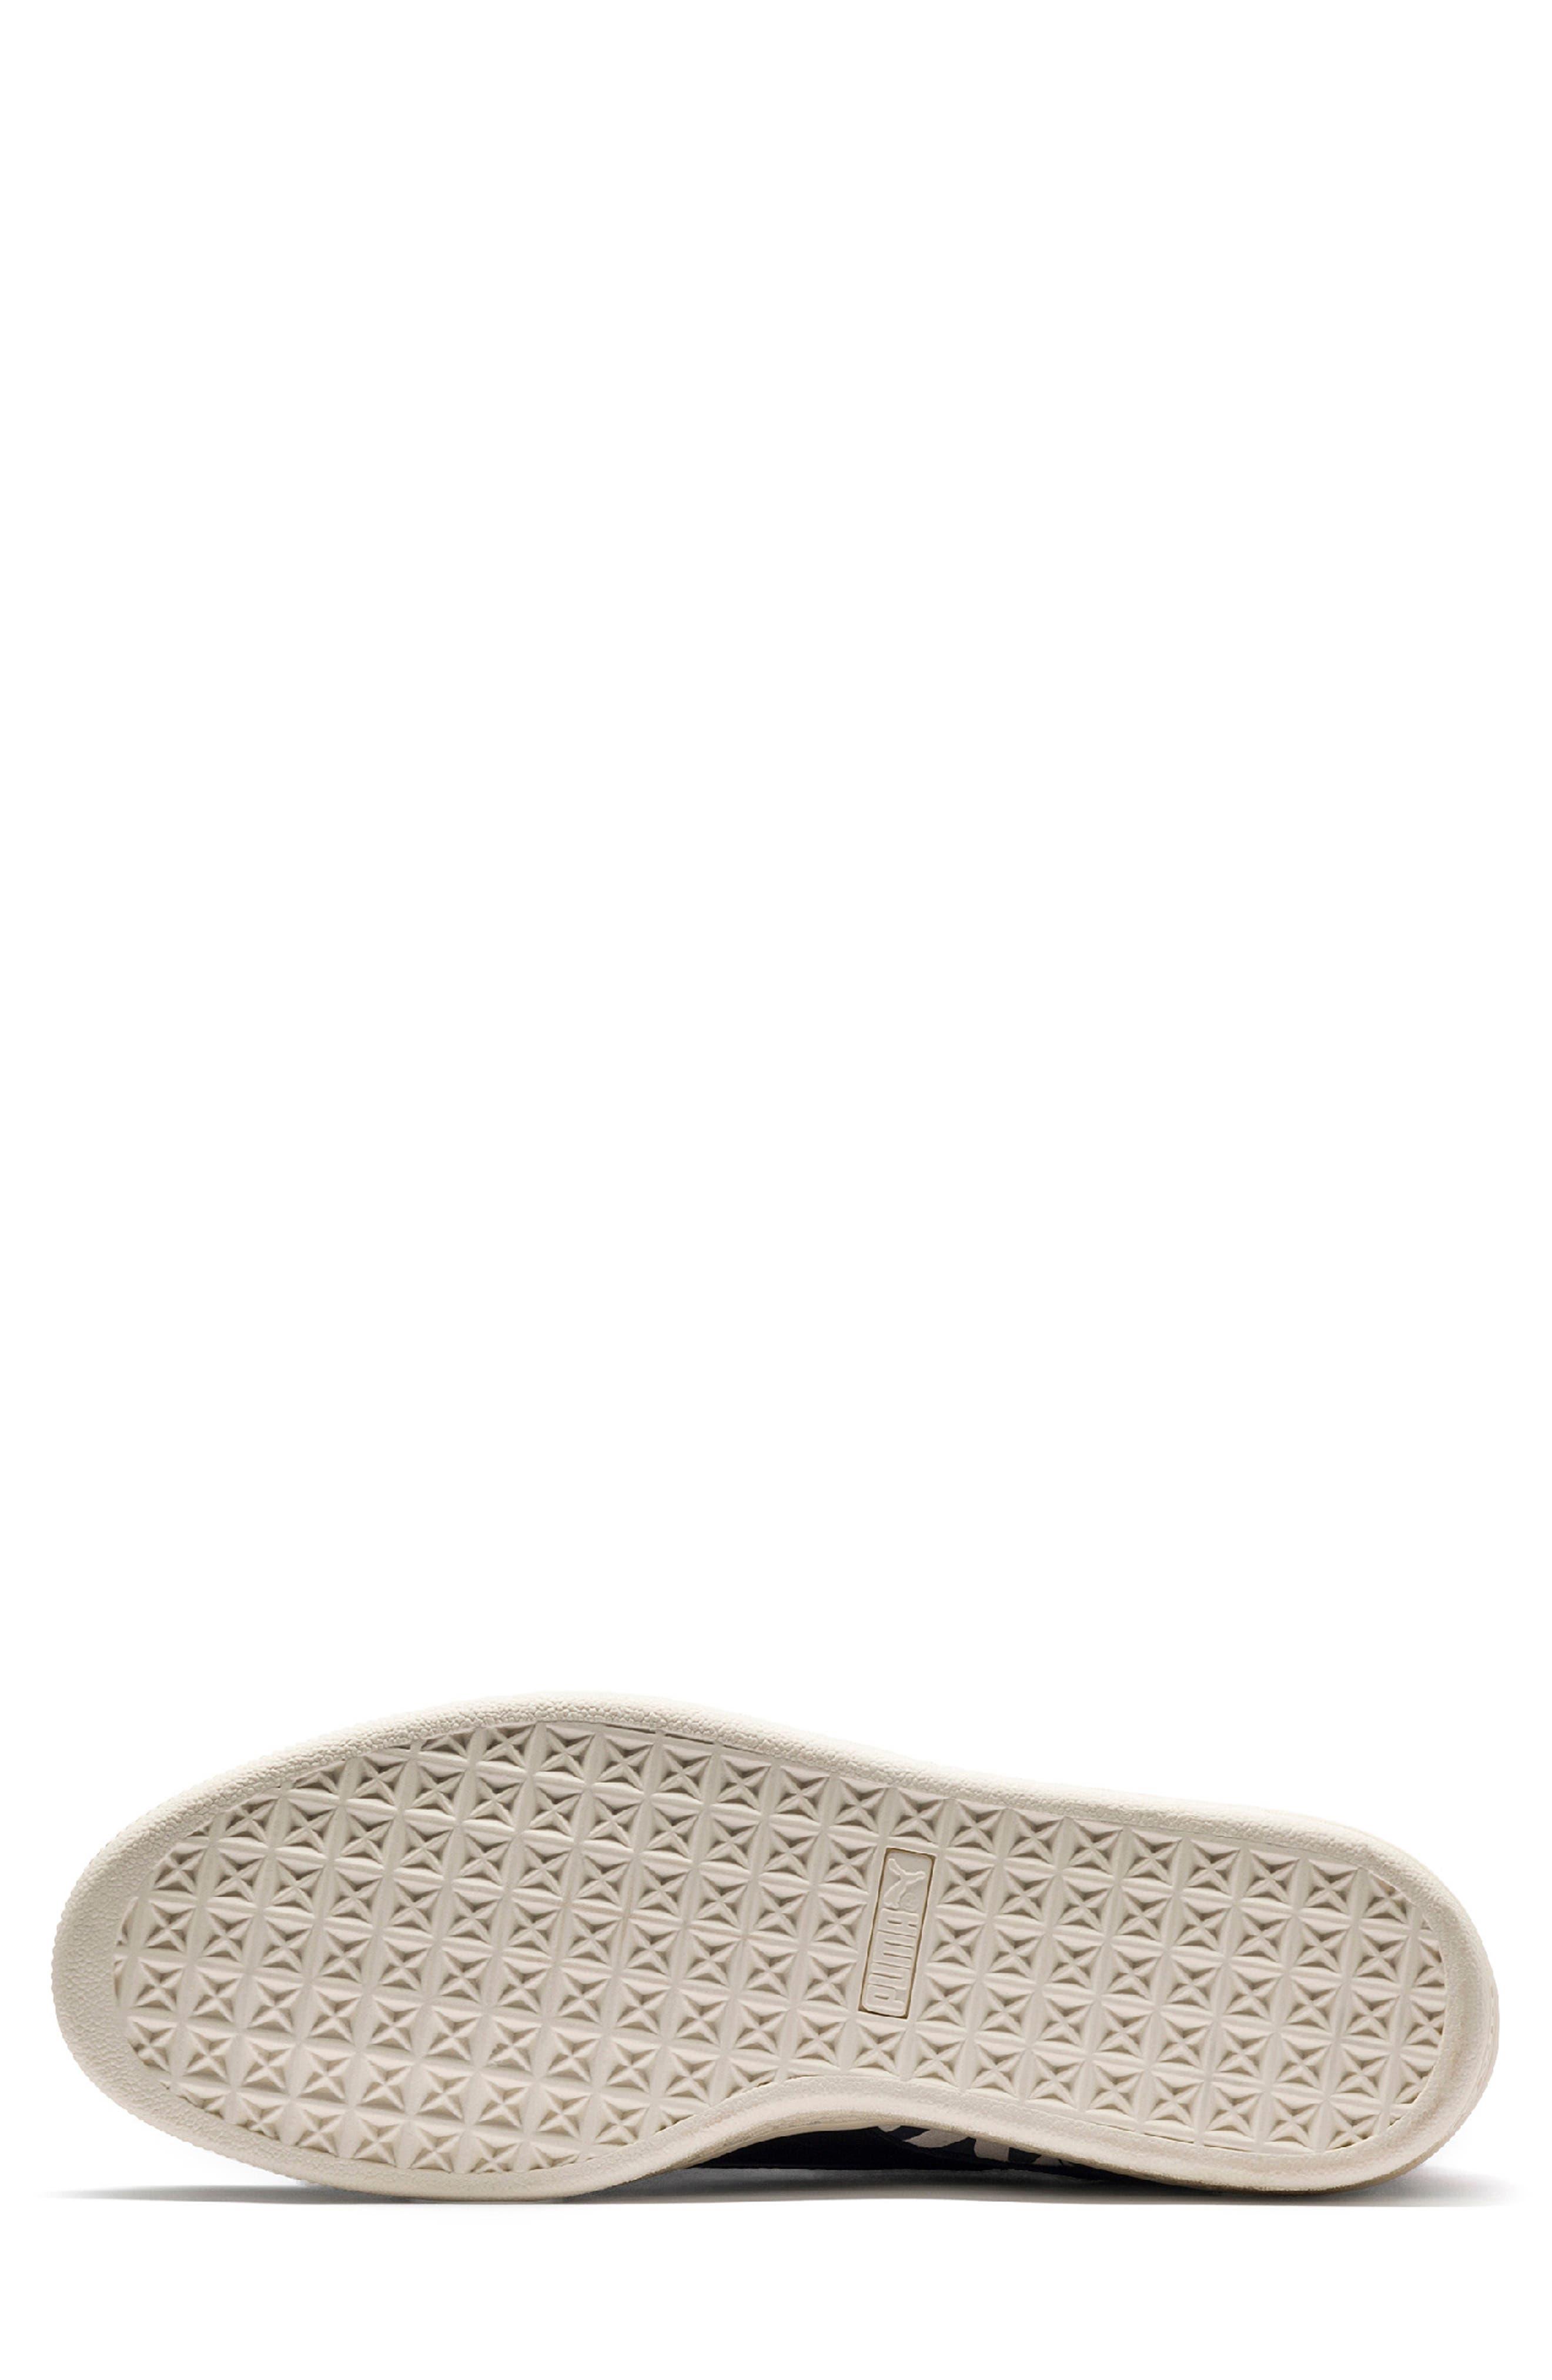 x Paul Stanley Suede Classic Sneaker,                             Alternate thumbnail 4, color,                             100